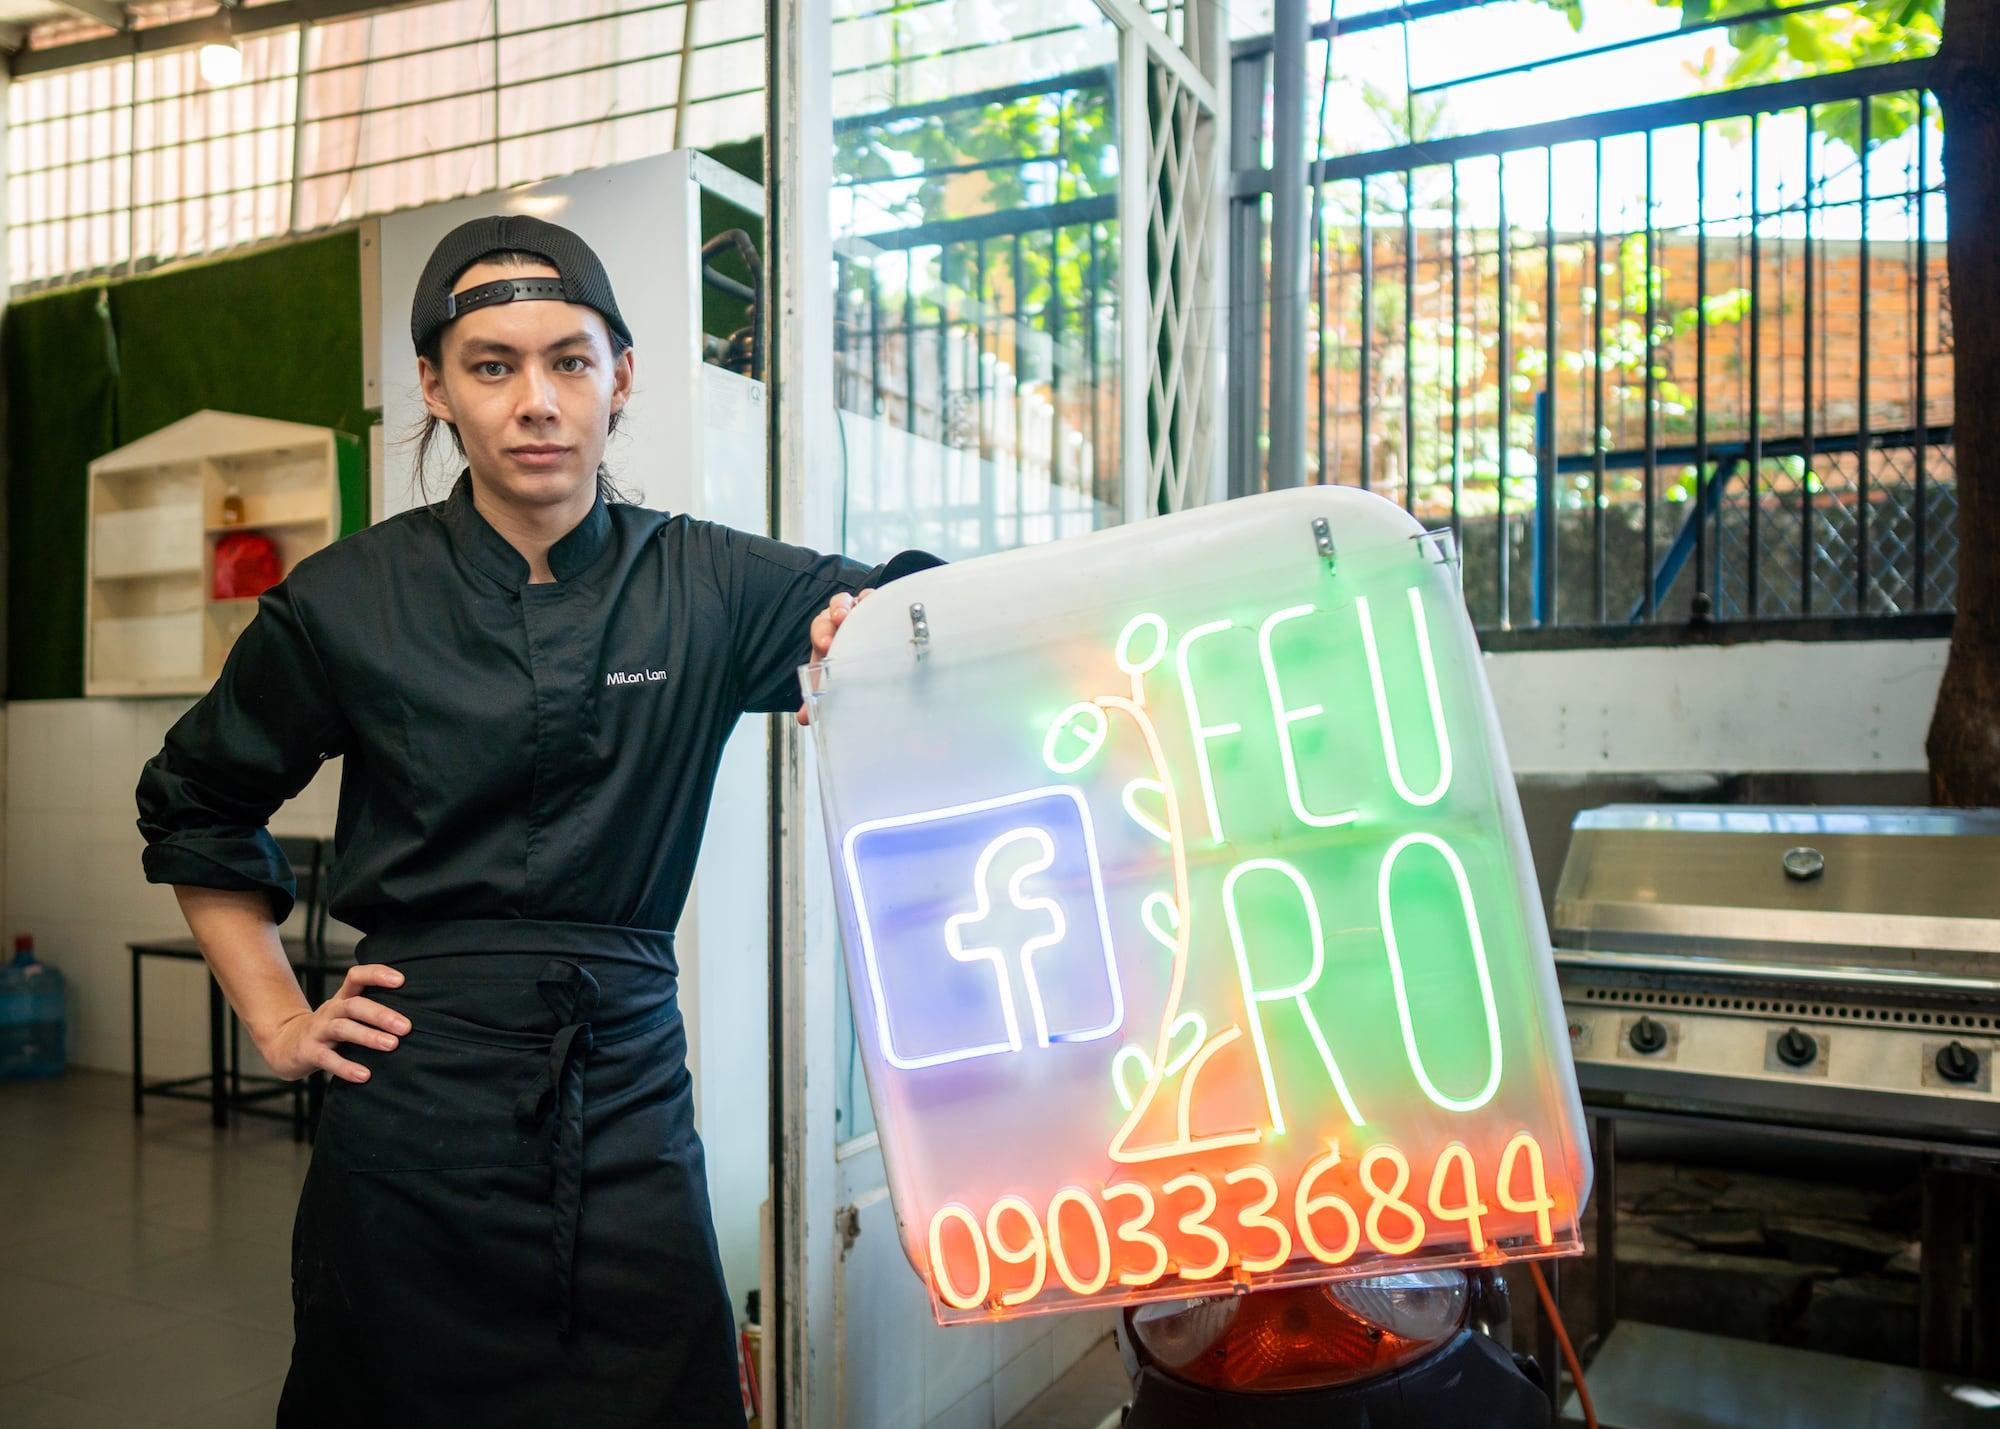 FEURO – European Fine Dining On Two Wheels